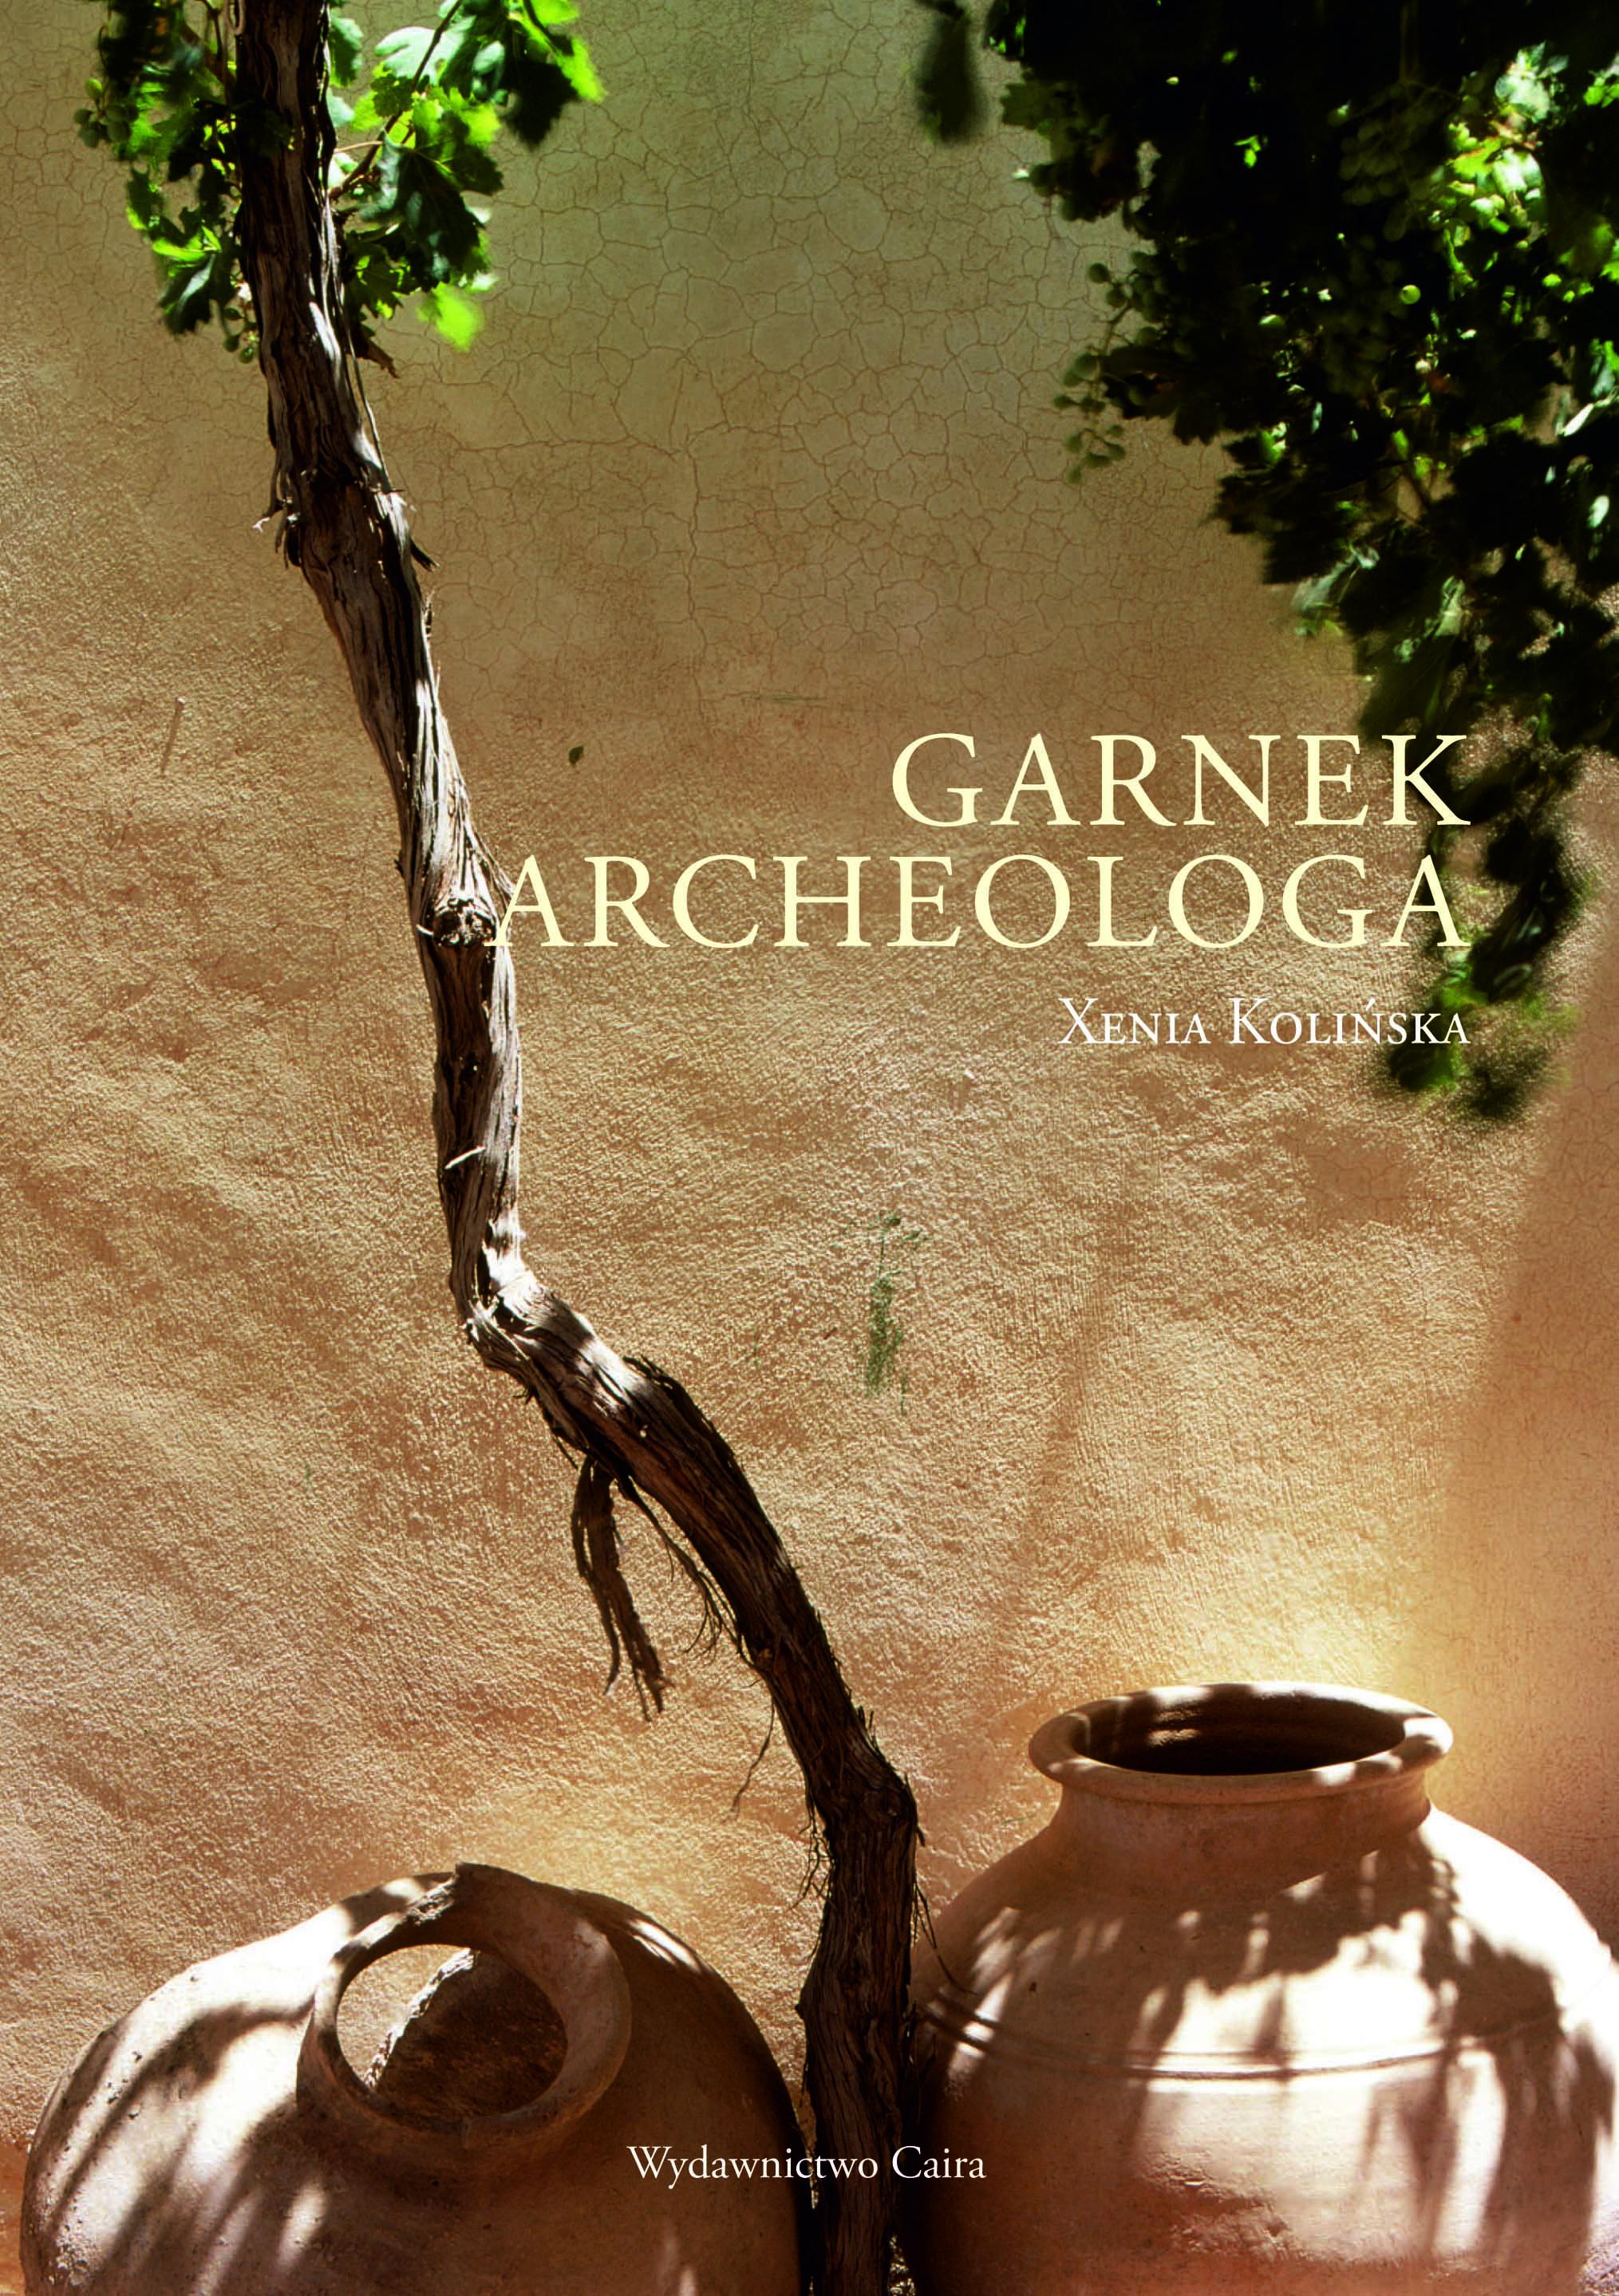 Garnek archeologa